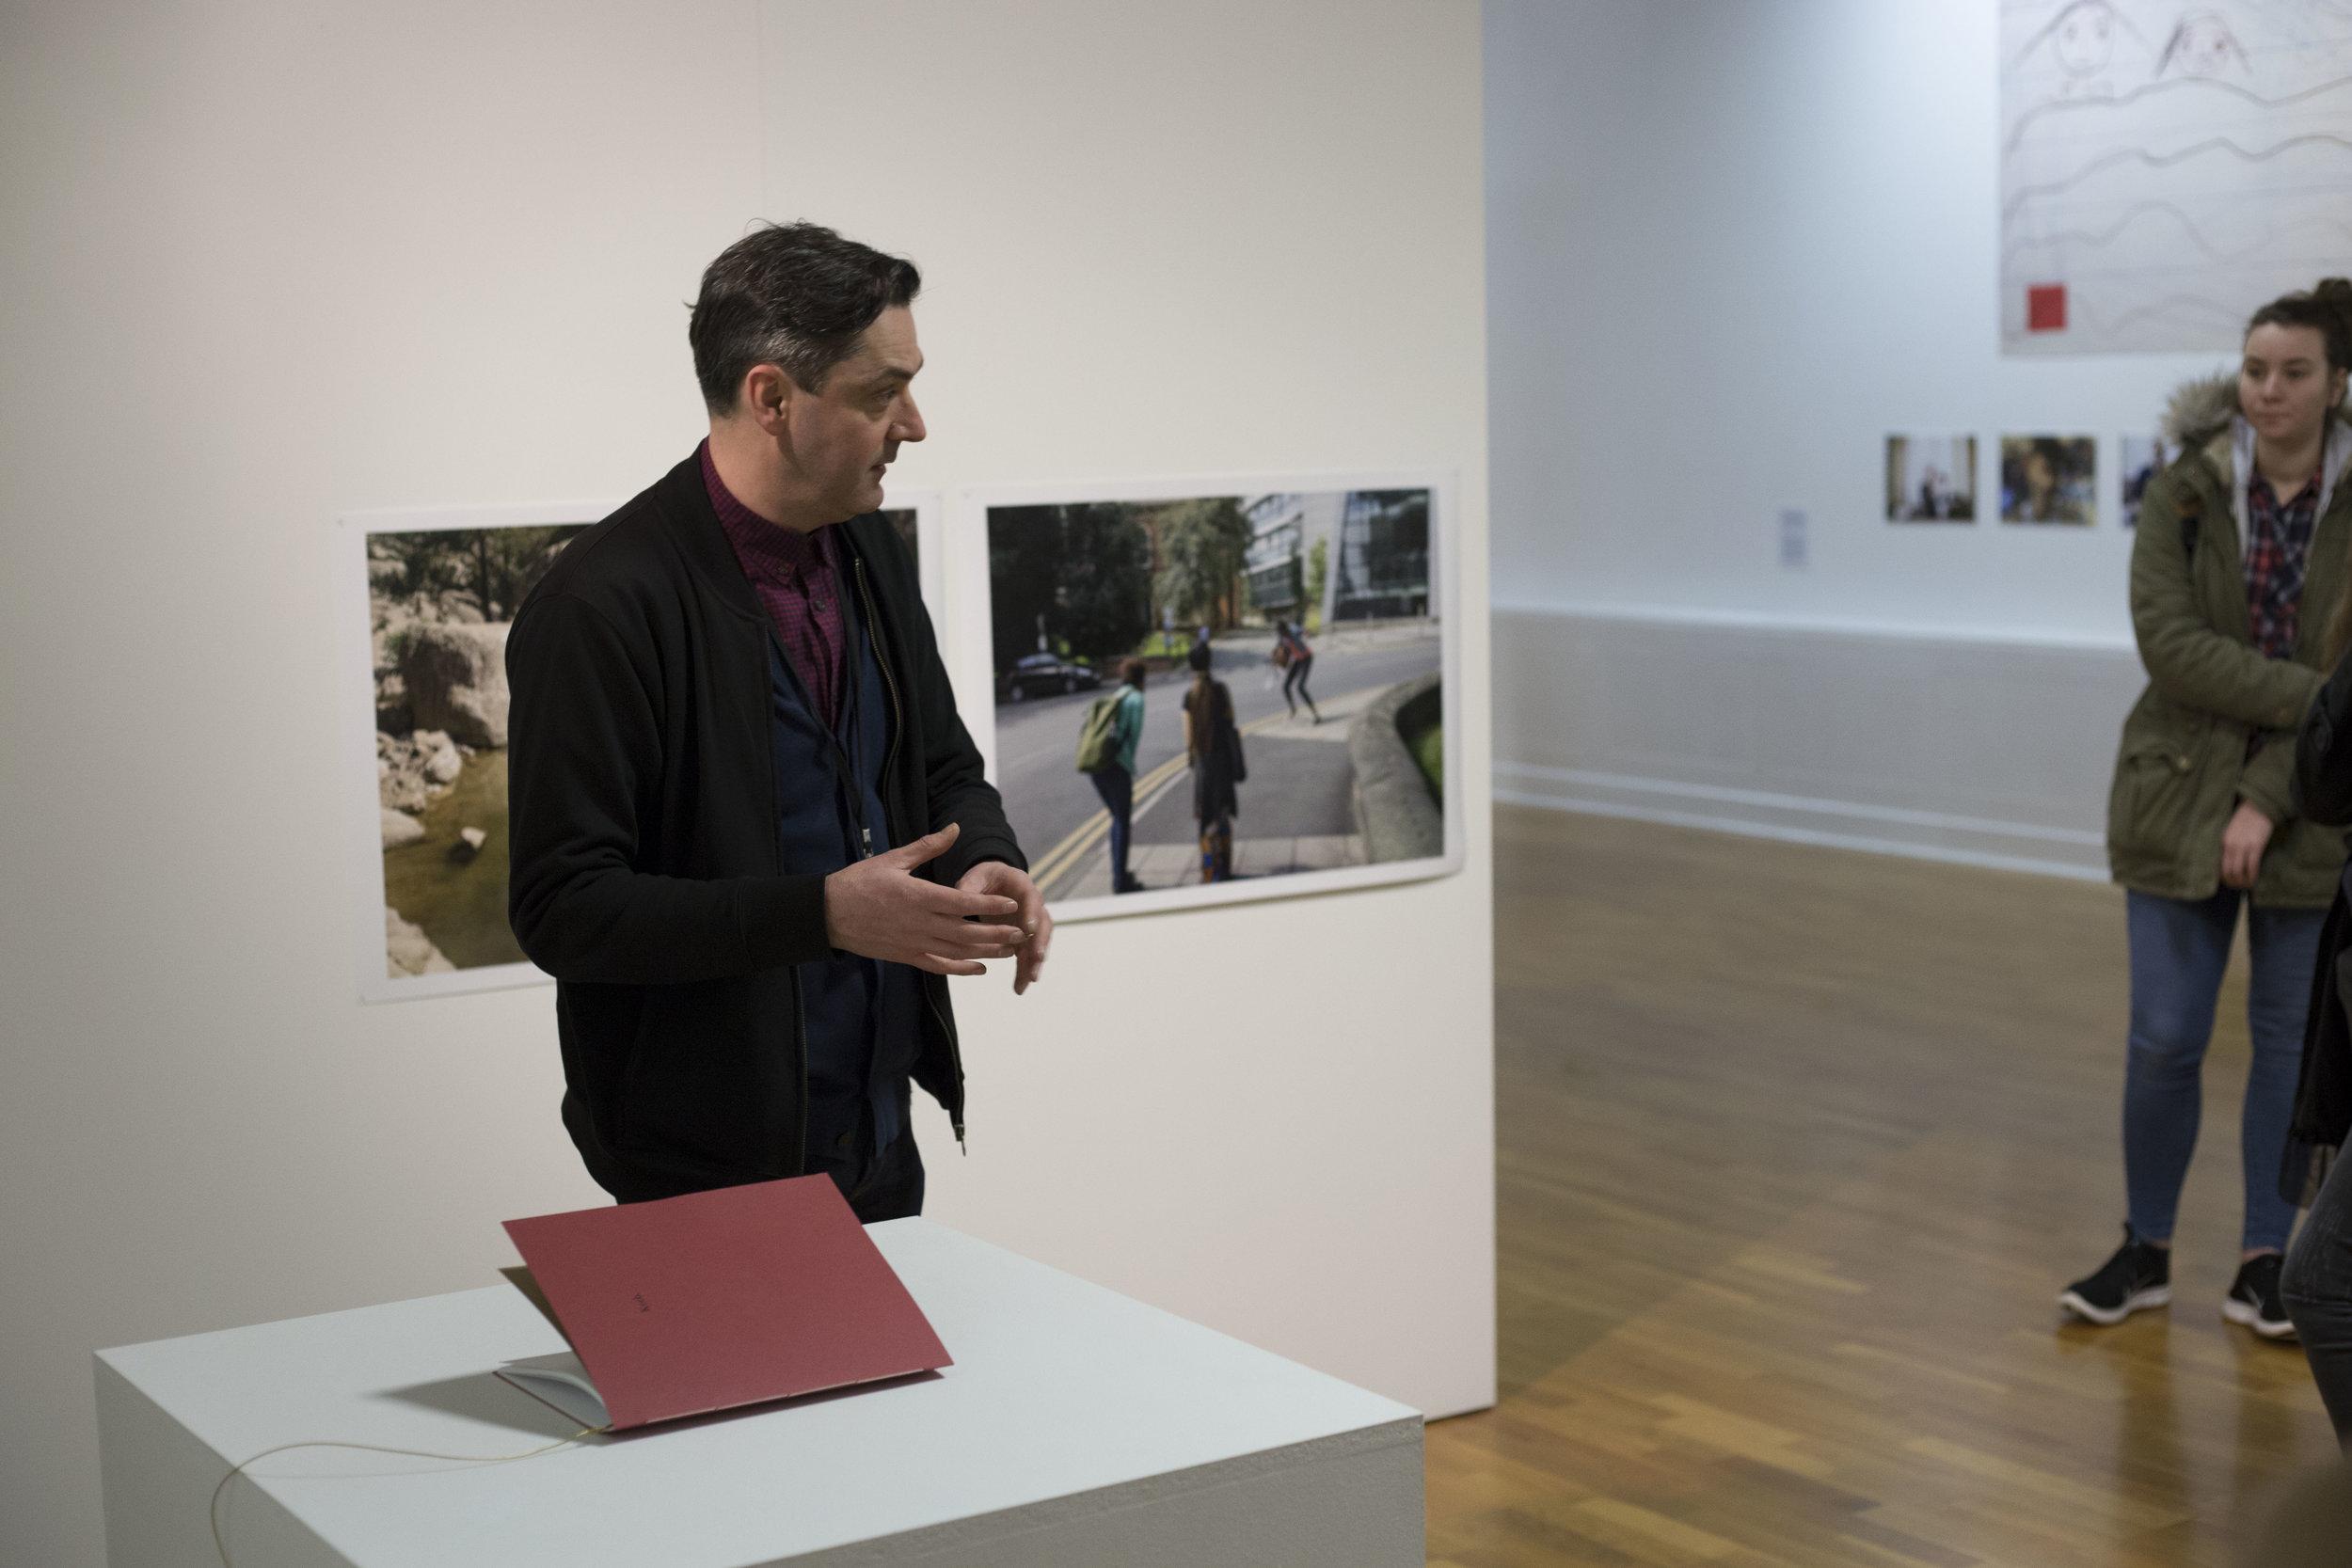 Richard M. Introducing his photo book entitled 'kerb'